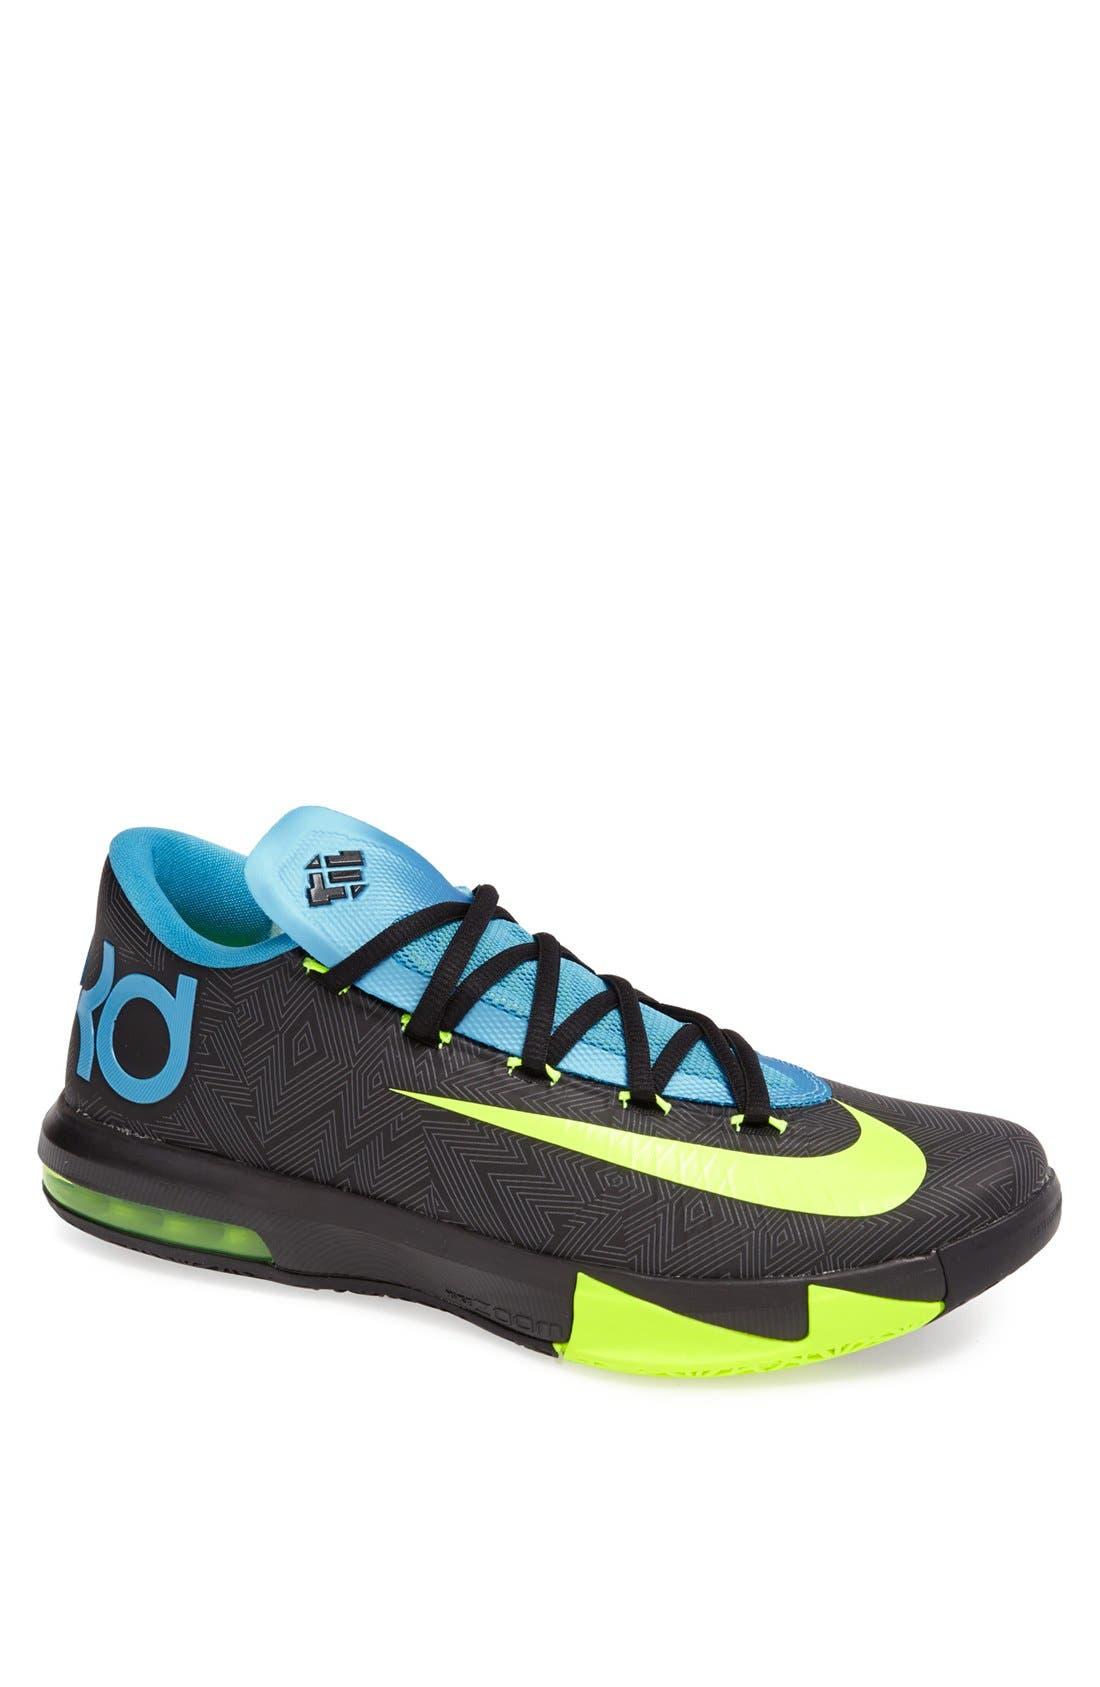 Main Image - Nike 'KD VI' Basketball Shoe (Men)